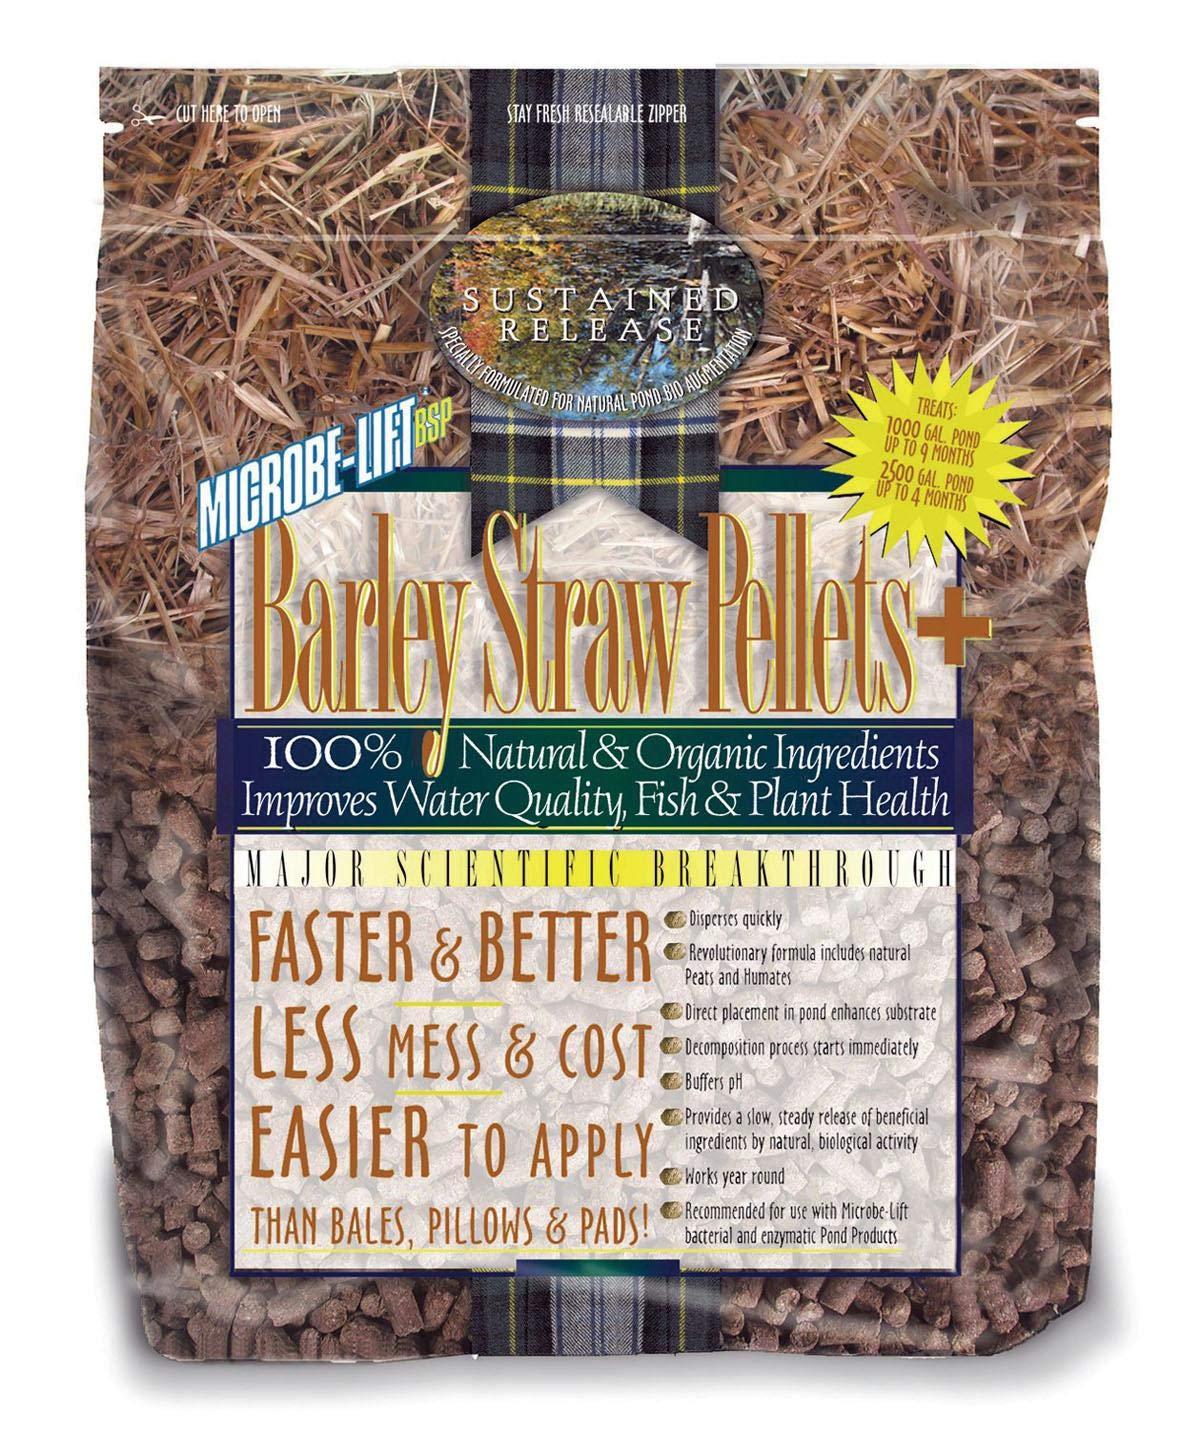 Ecological Laboratories Microbe-Lift Barley Straw Pellets PLUS (4.4 lbs.)